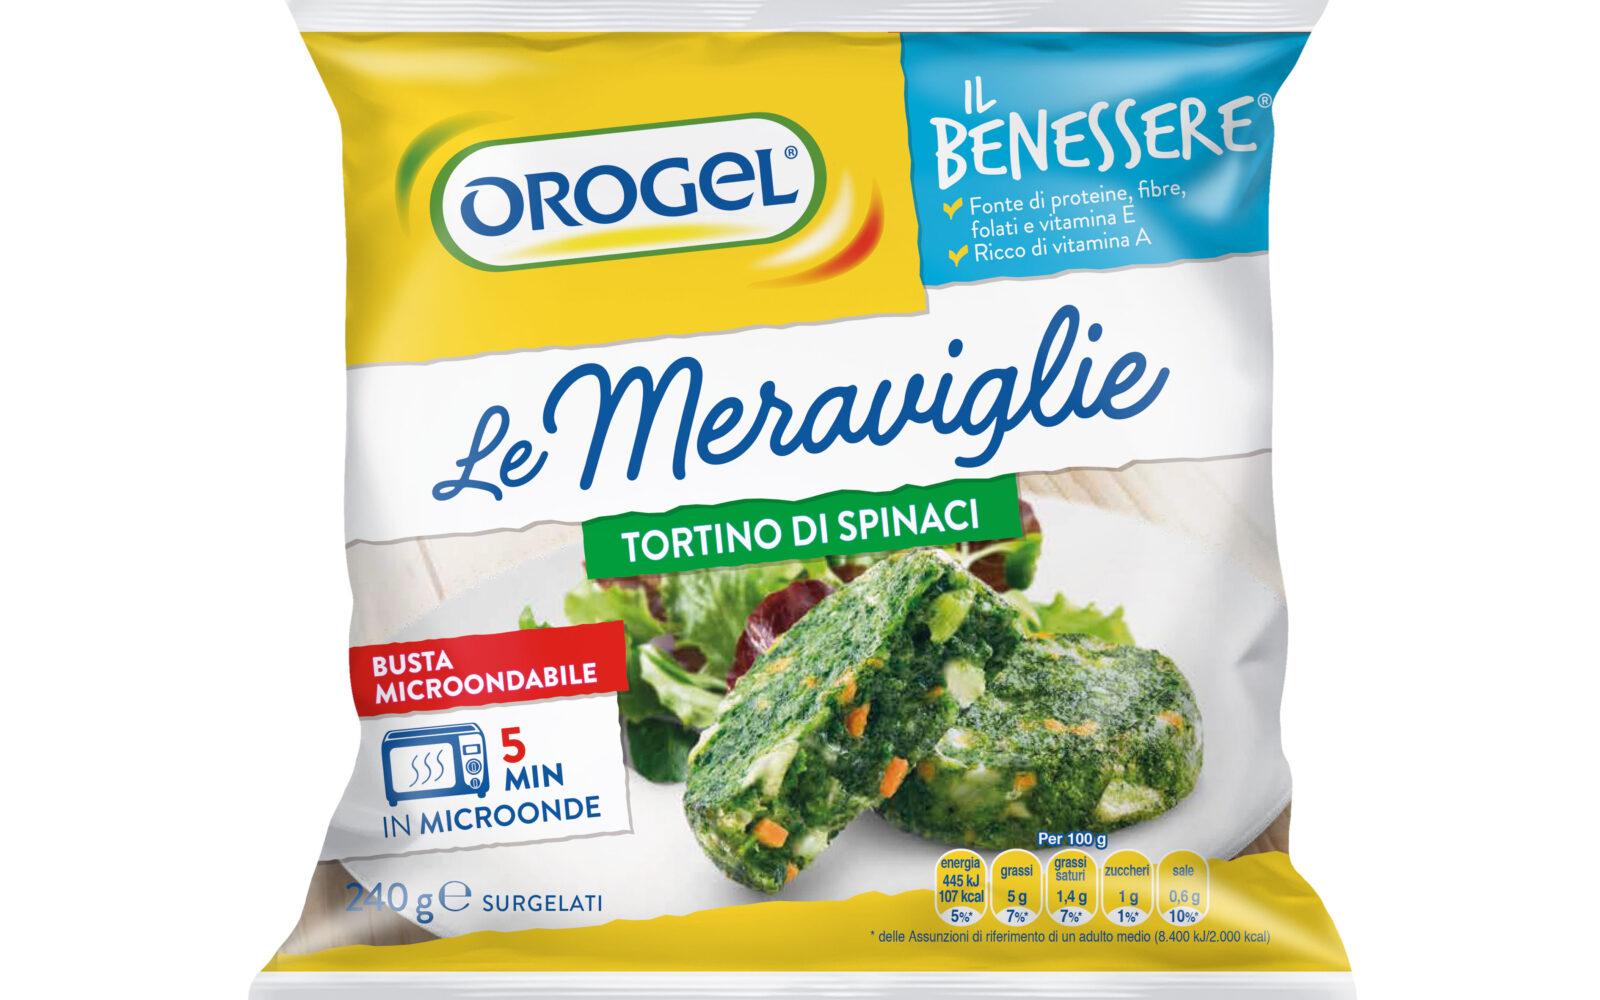 Orogel_LeMeraviglie_Tortino-di-spinaci